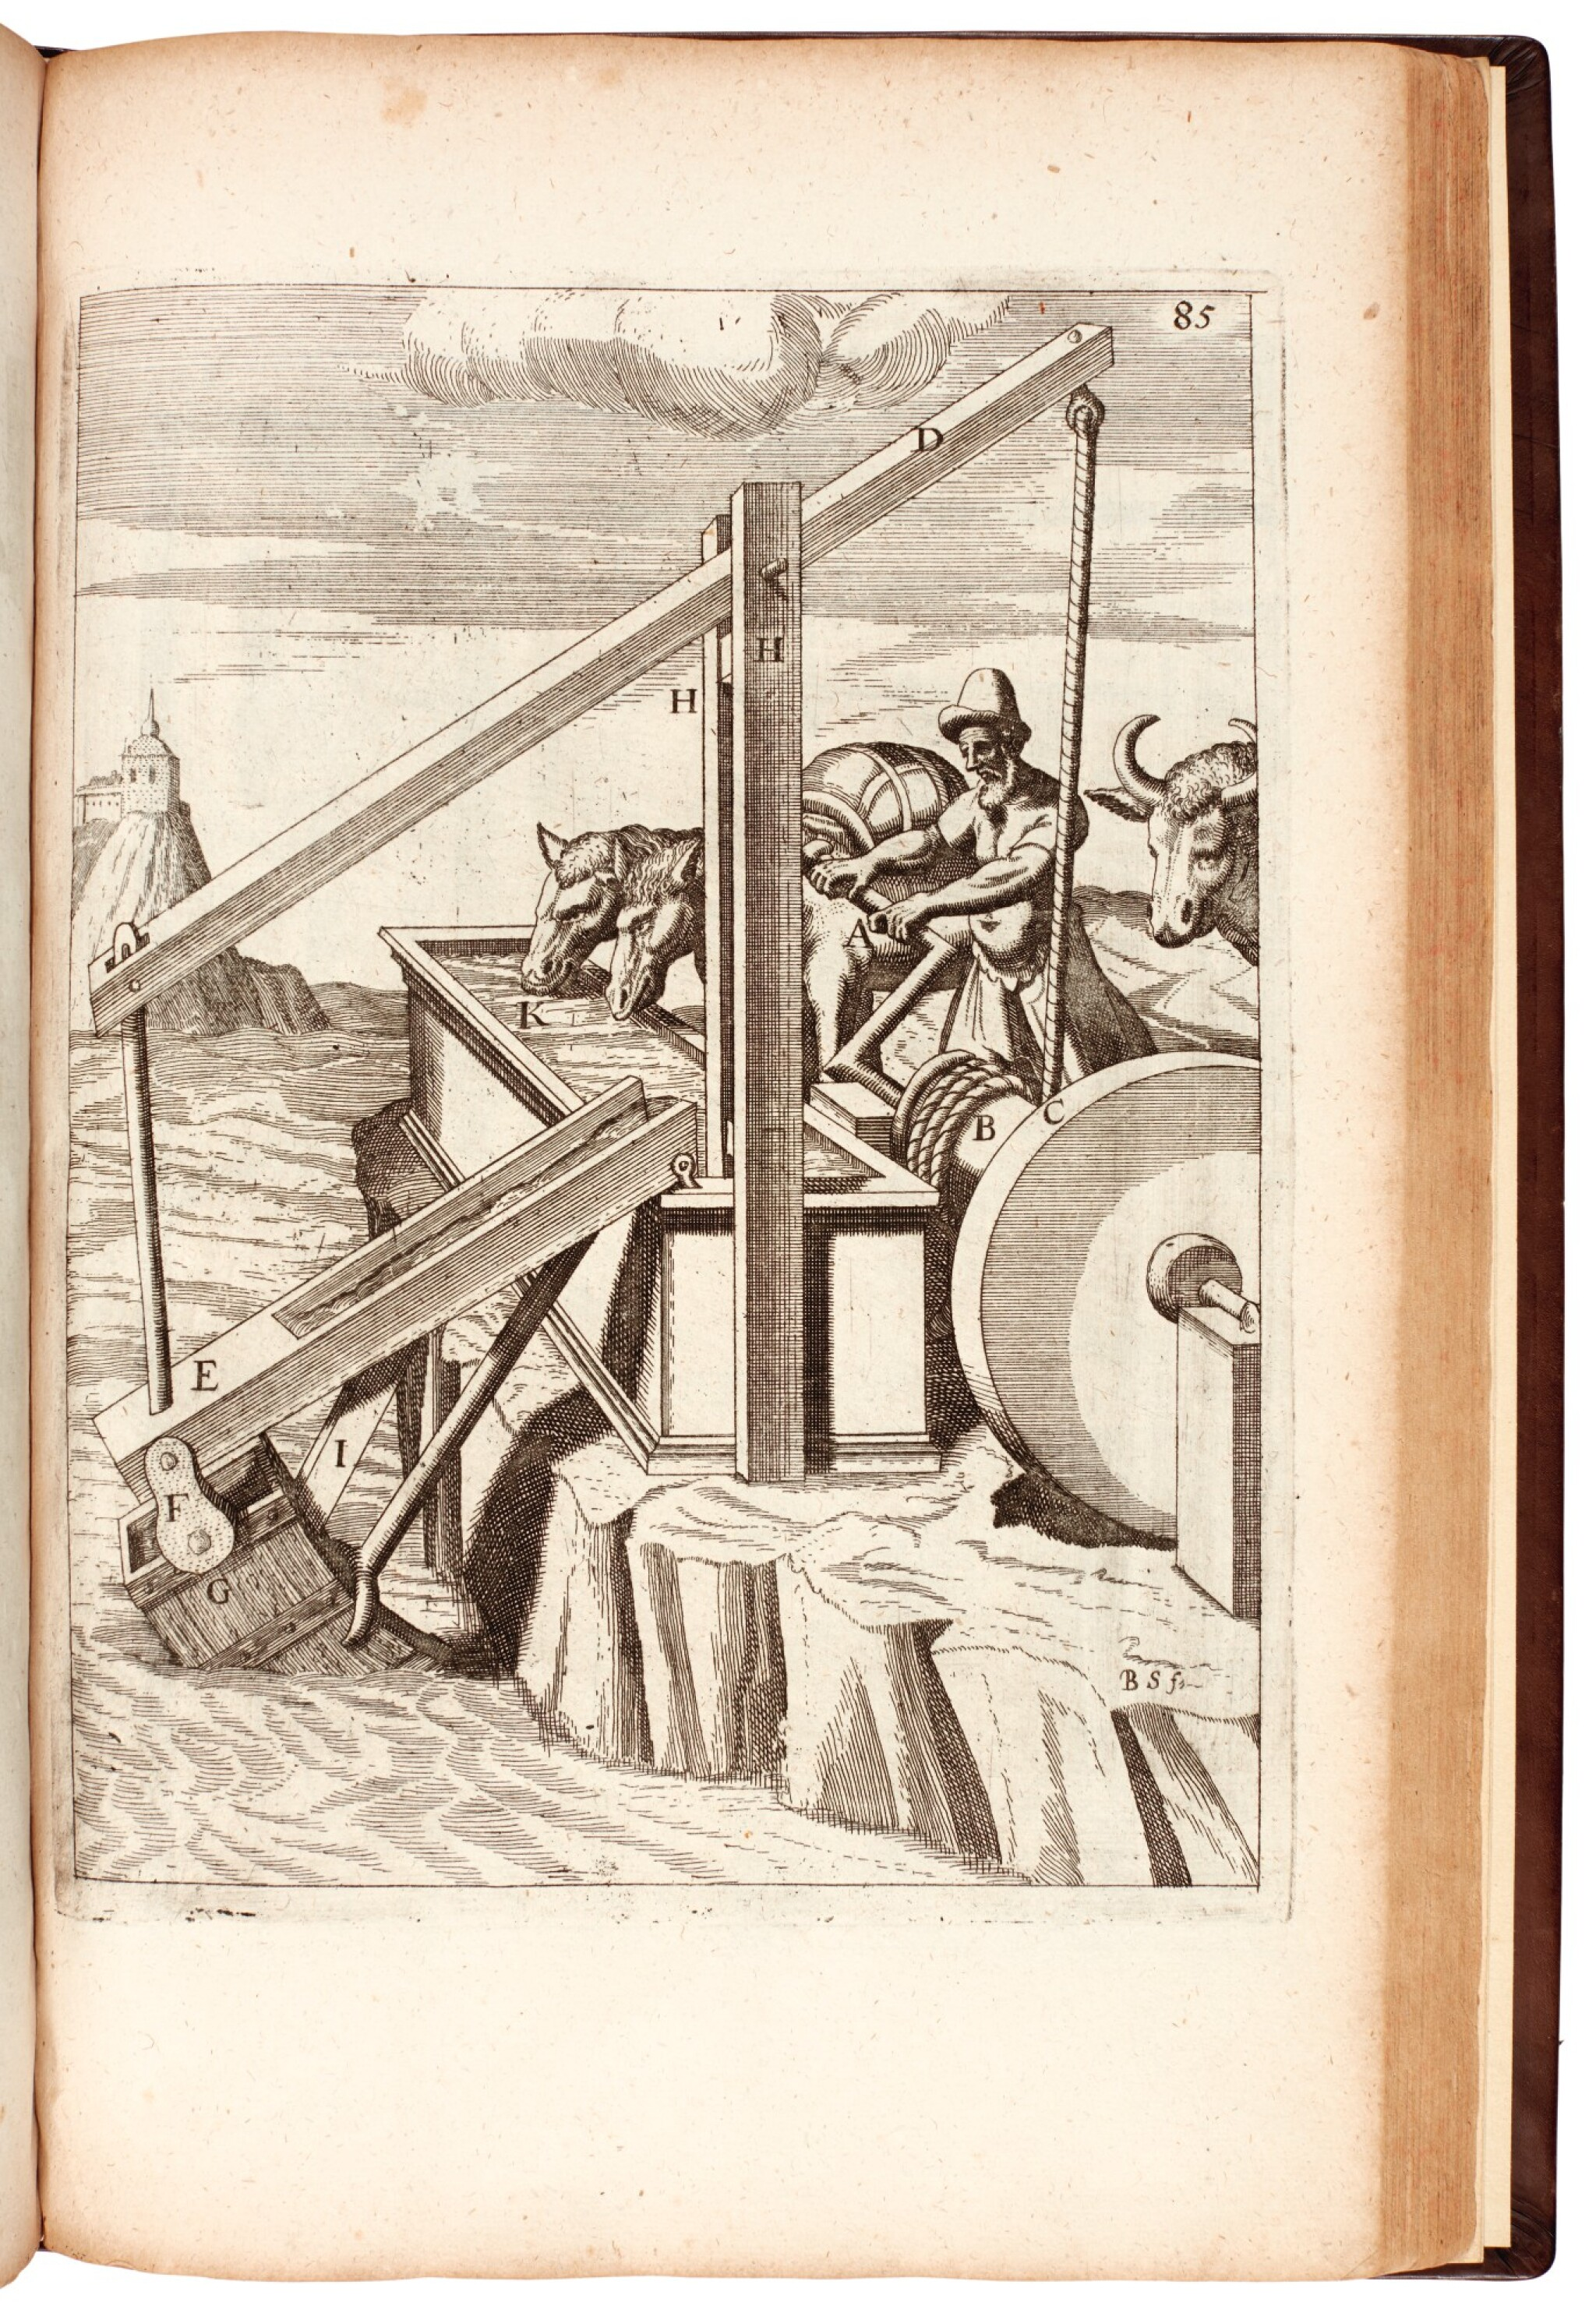 View full screen - View 1 of Lot 4. Böckler | Theatrum machinarum novum, 1686.